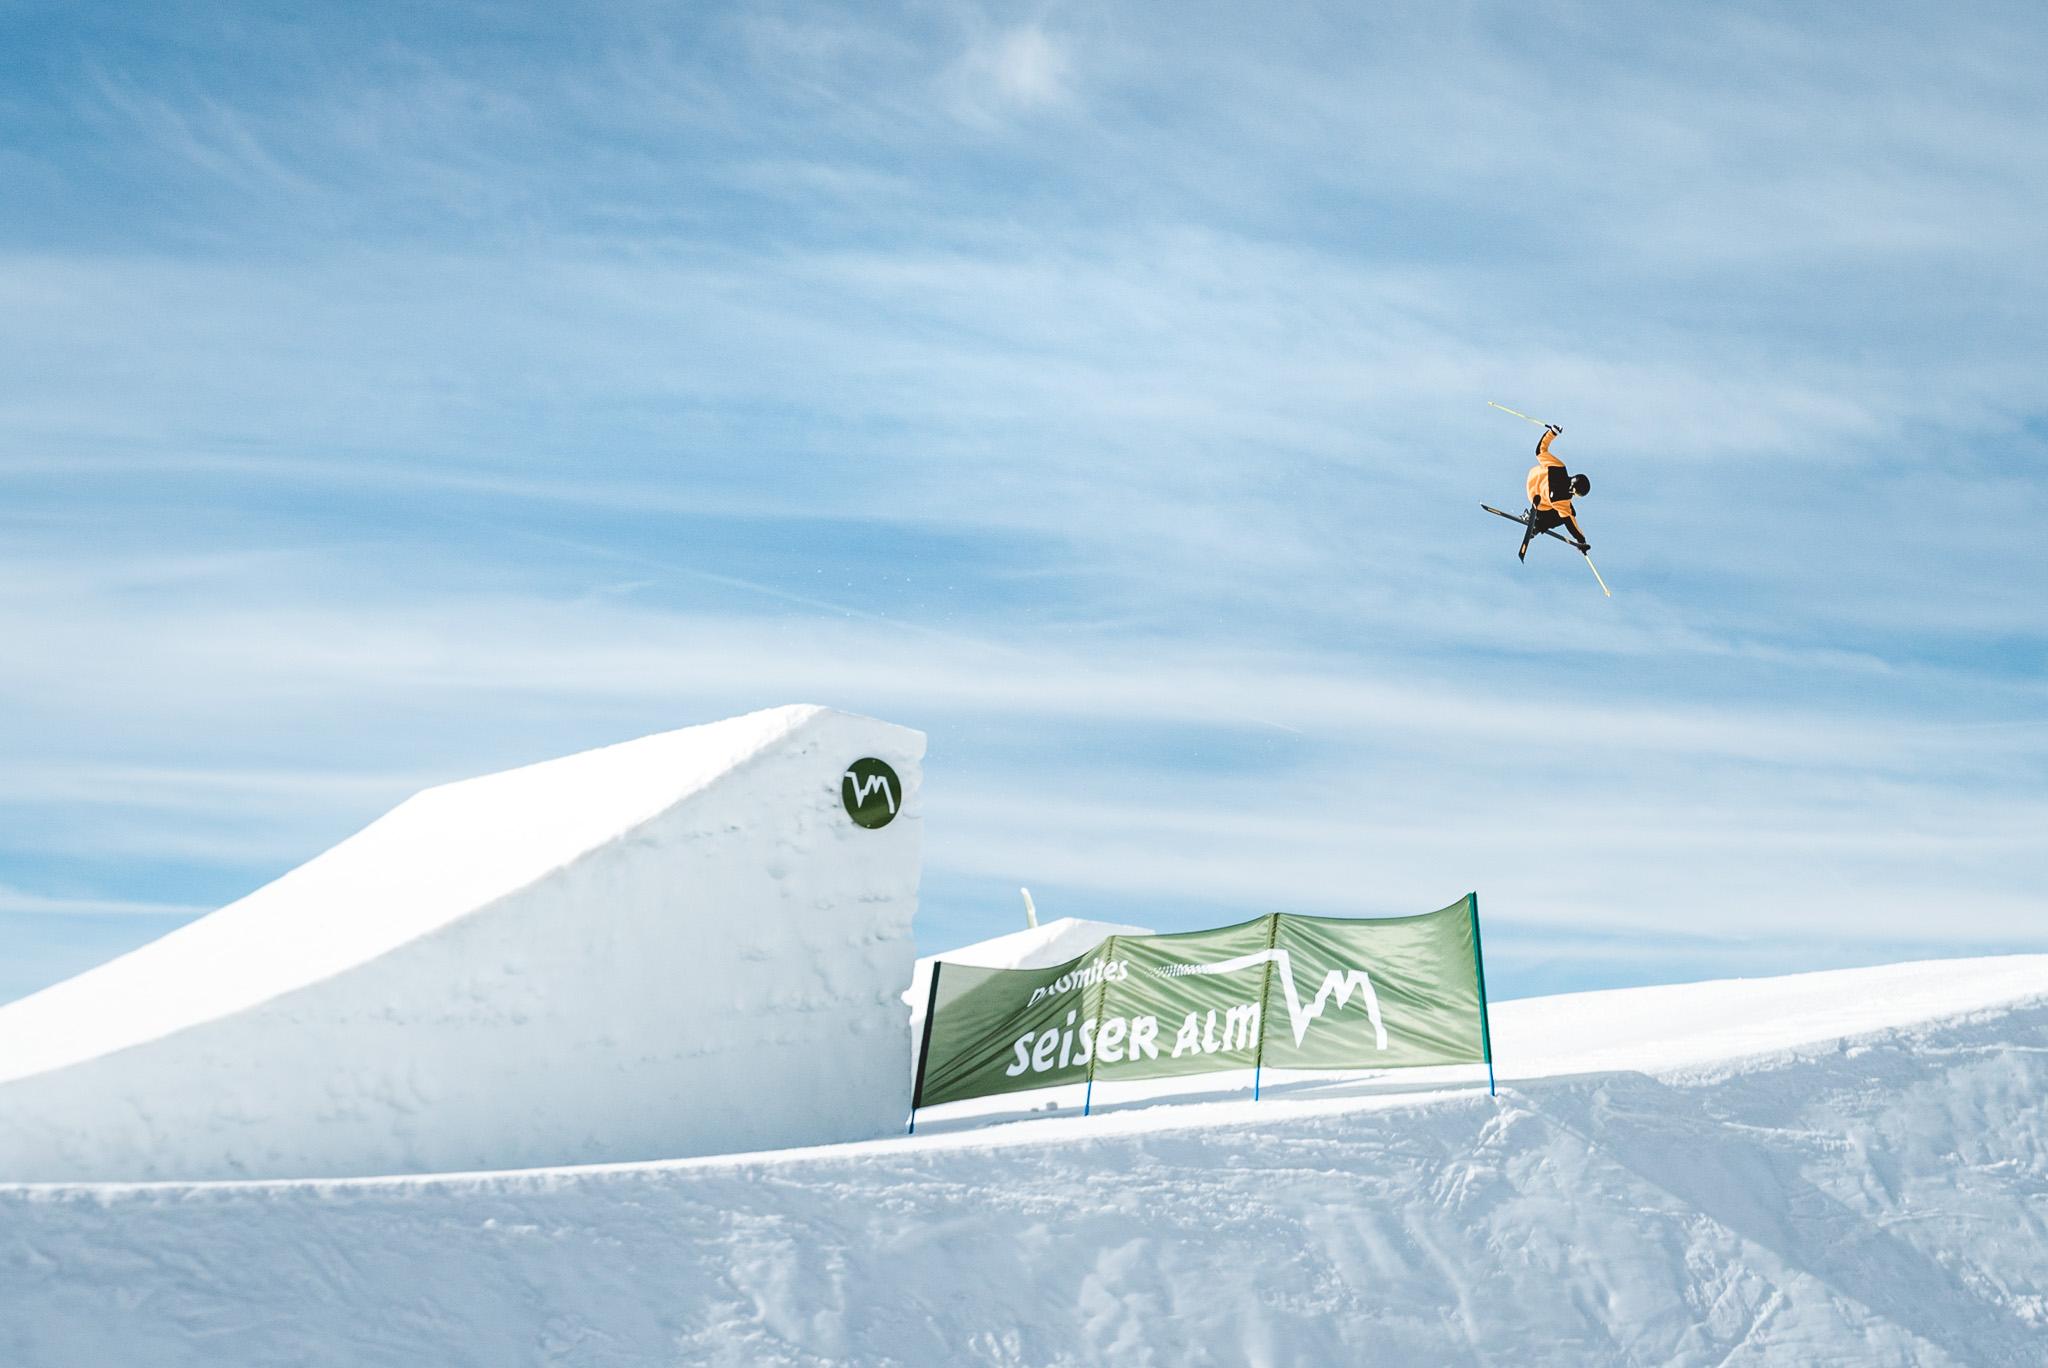 PRIME Report: Das Setup im Snowpark Seiser Alm (Winter 2020) - Rider: Pascal Runggaldier